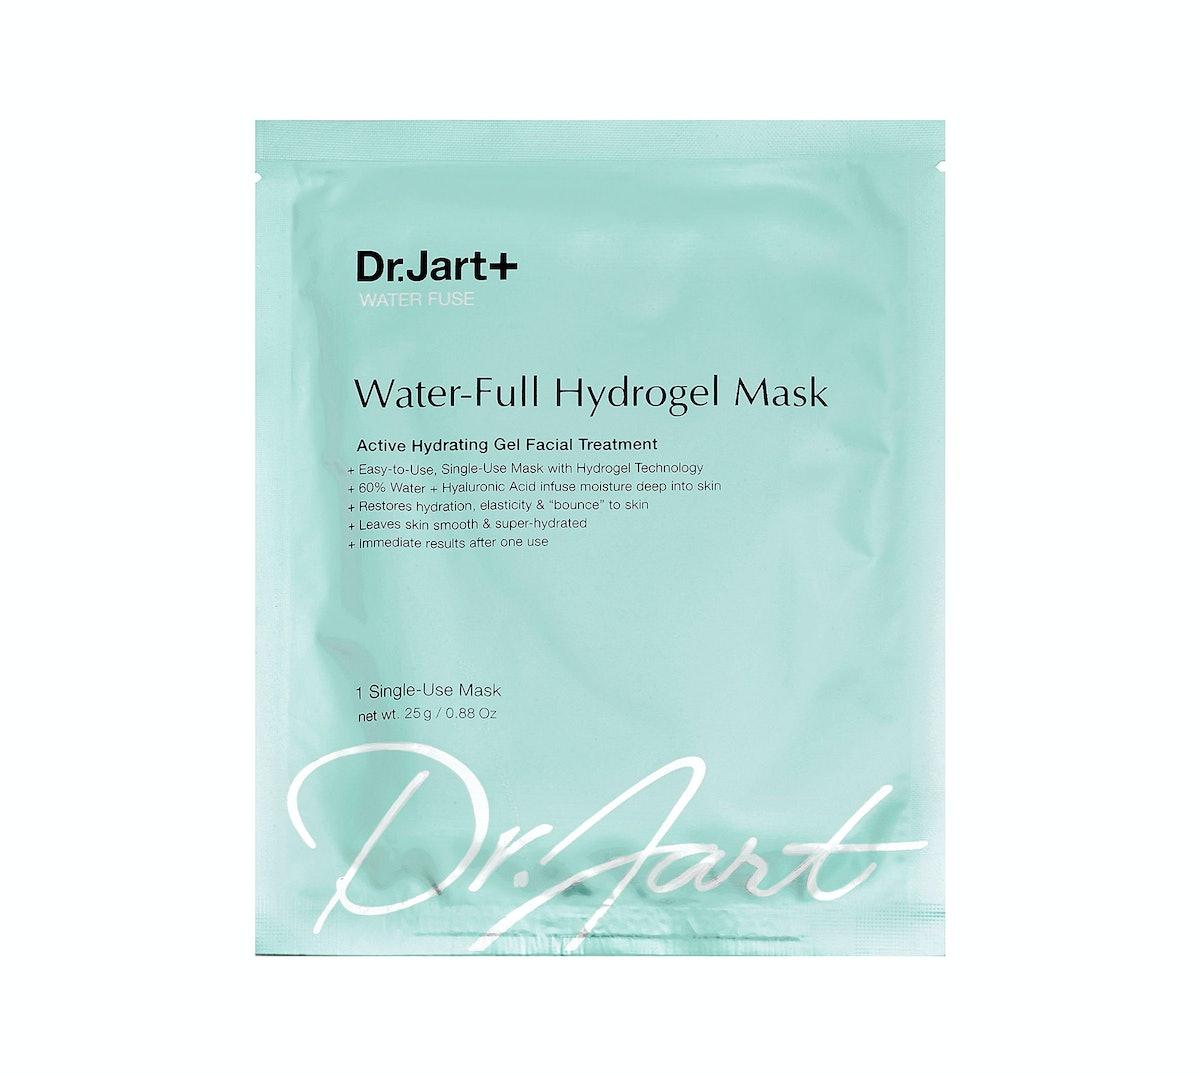 Dr. Jart Water Fuse Water-Full Hydrogel Mask